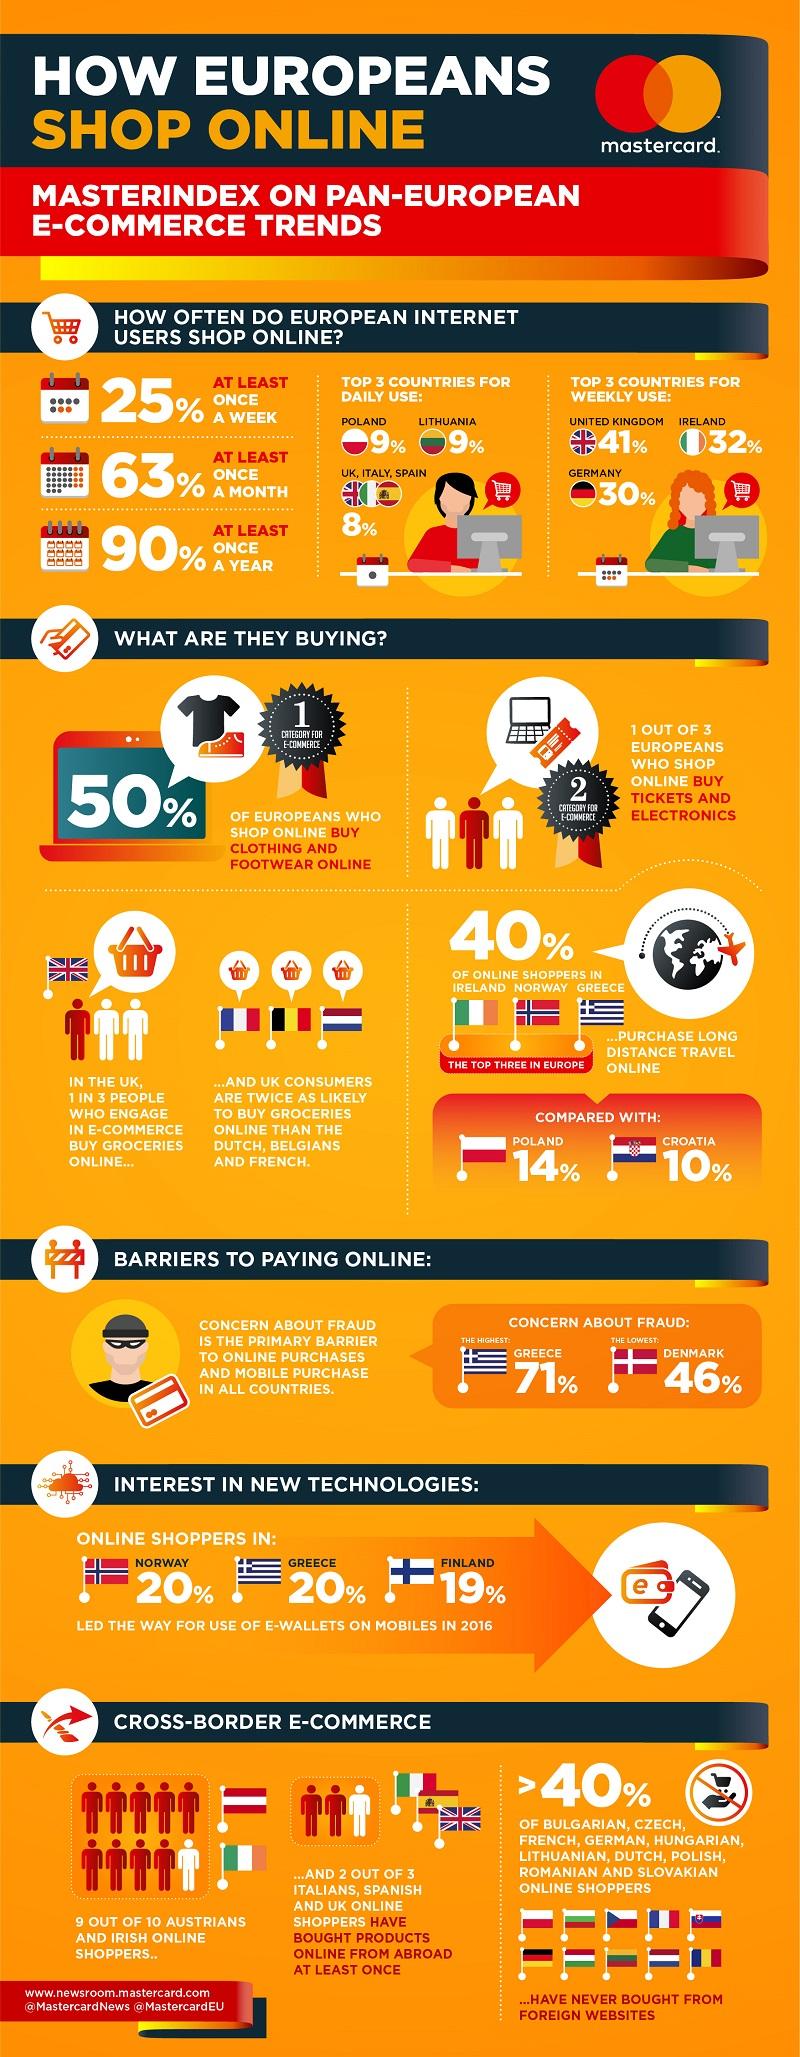 Badanie Masterindex 2017 (infografika)